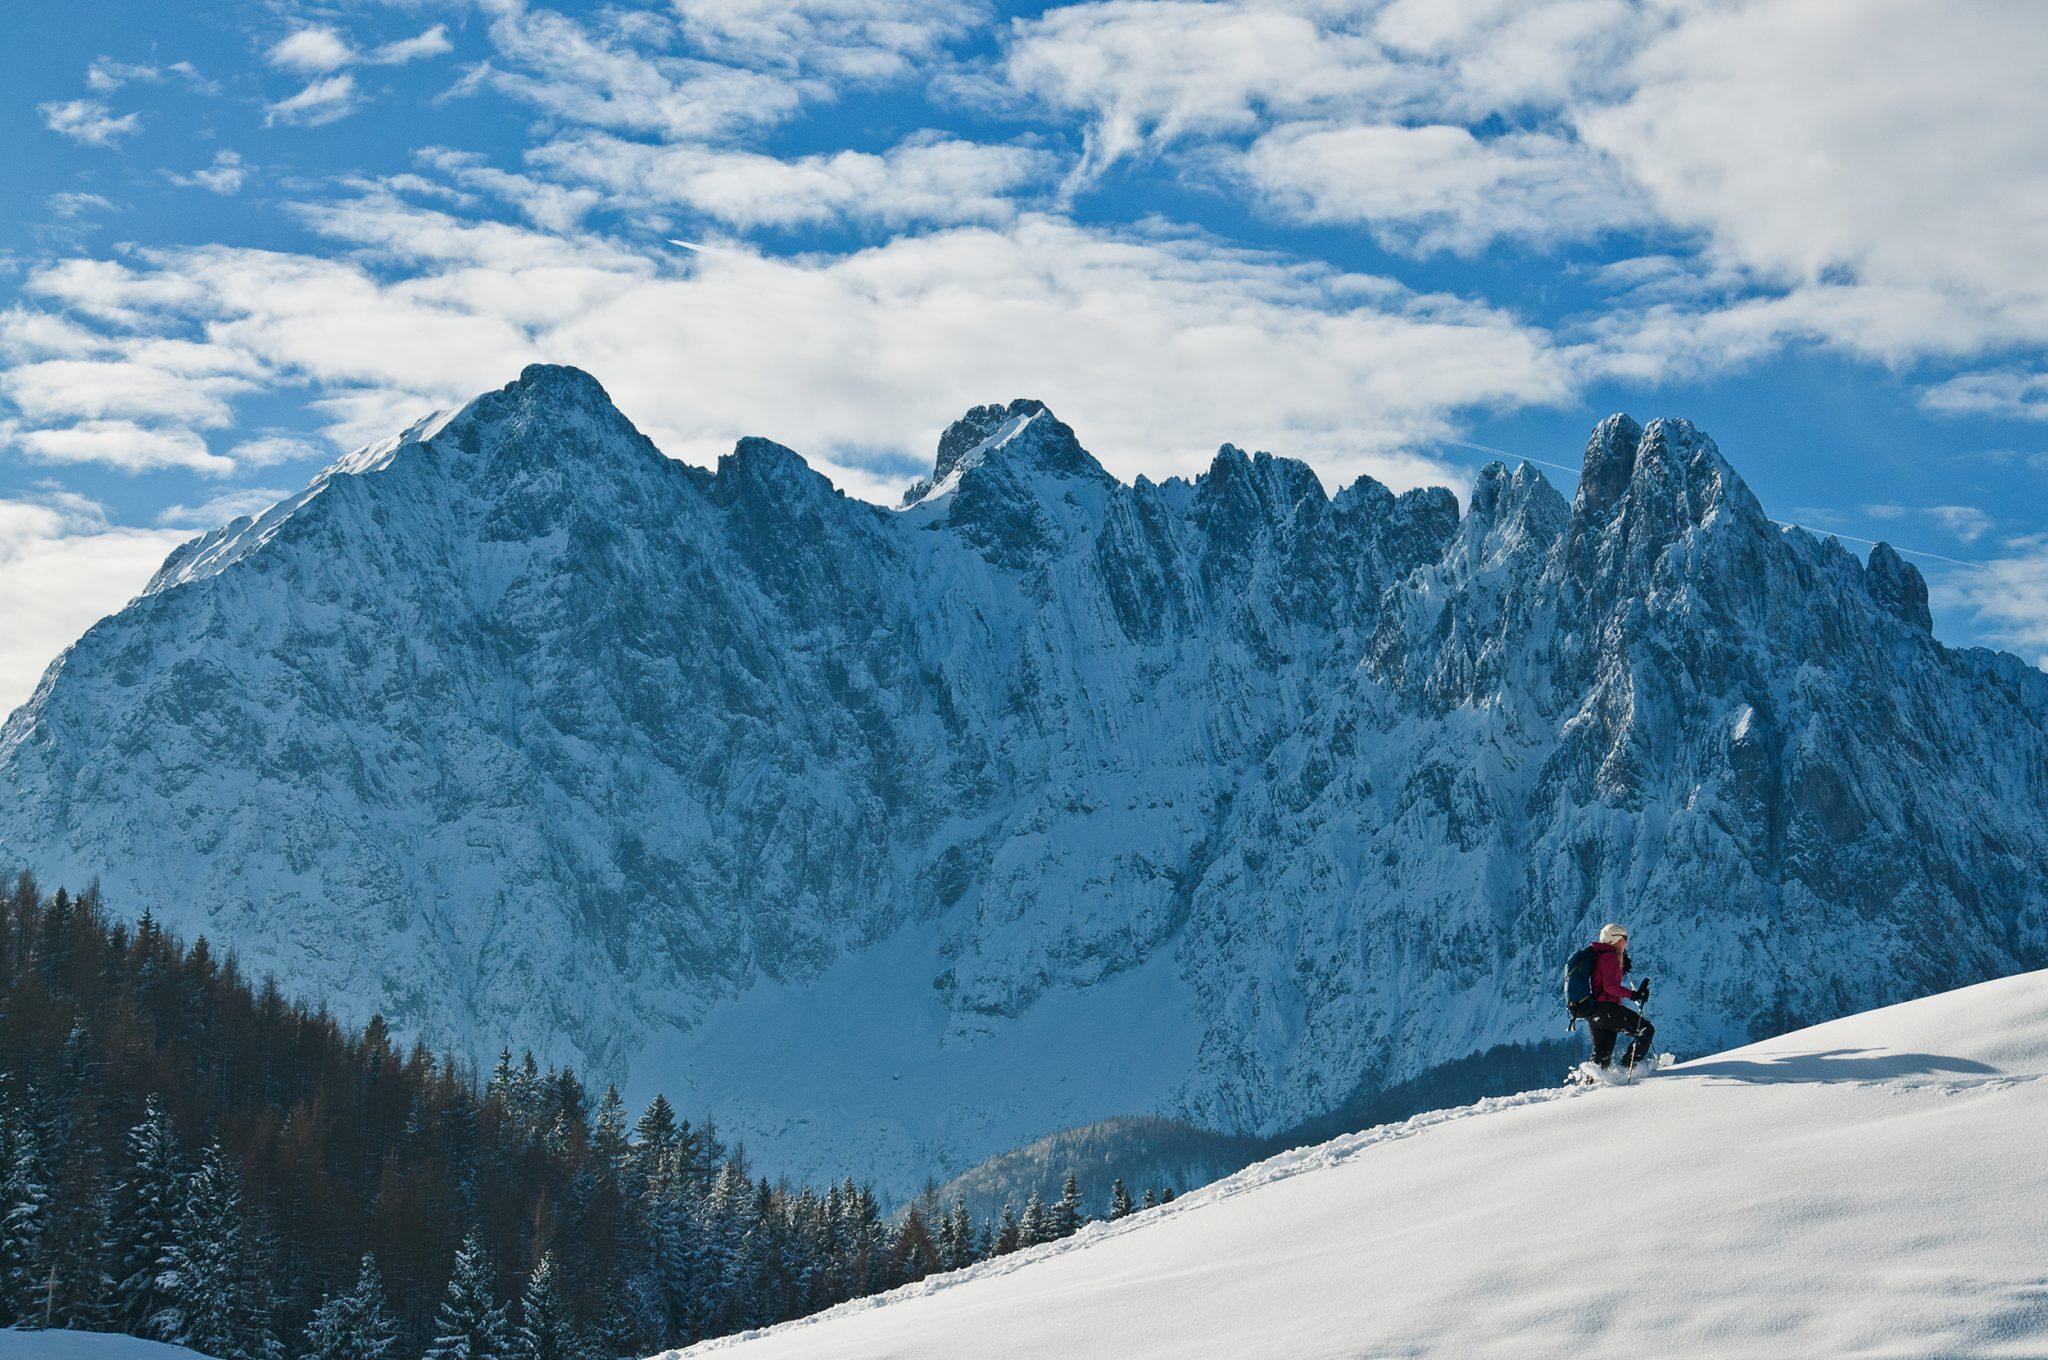 urlaub-winter-gebetsroither-schneeschuhwandern-koessen-tirol-sportundnatur-5